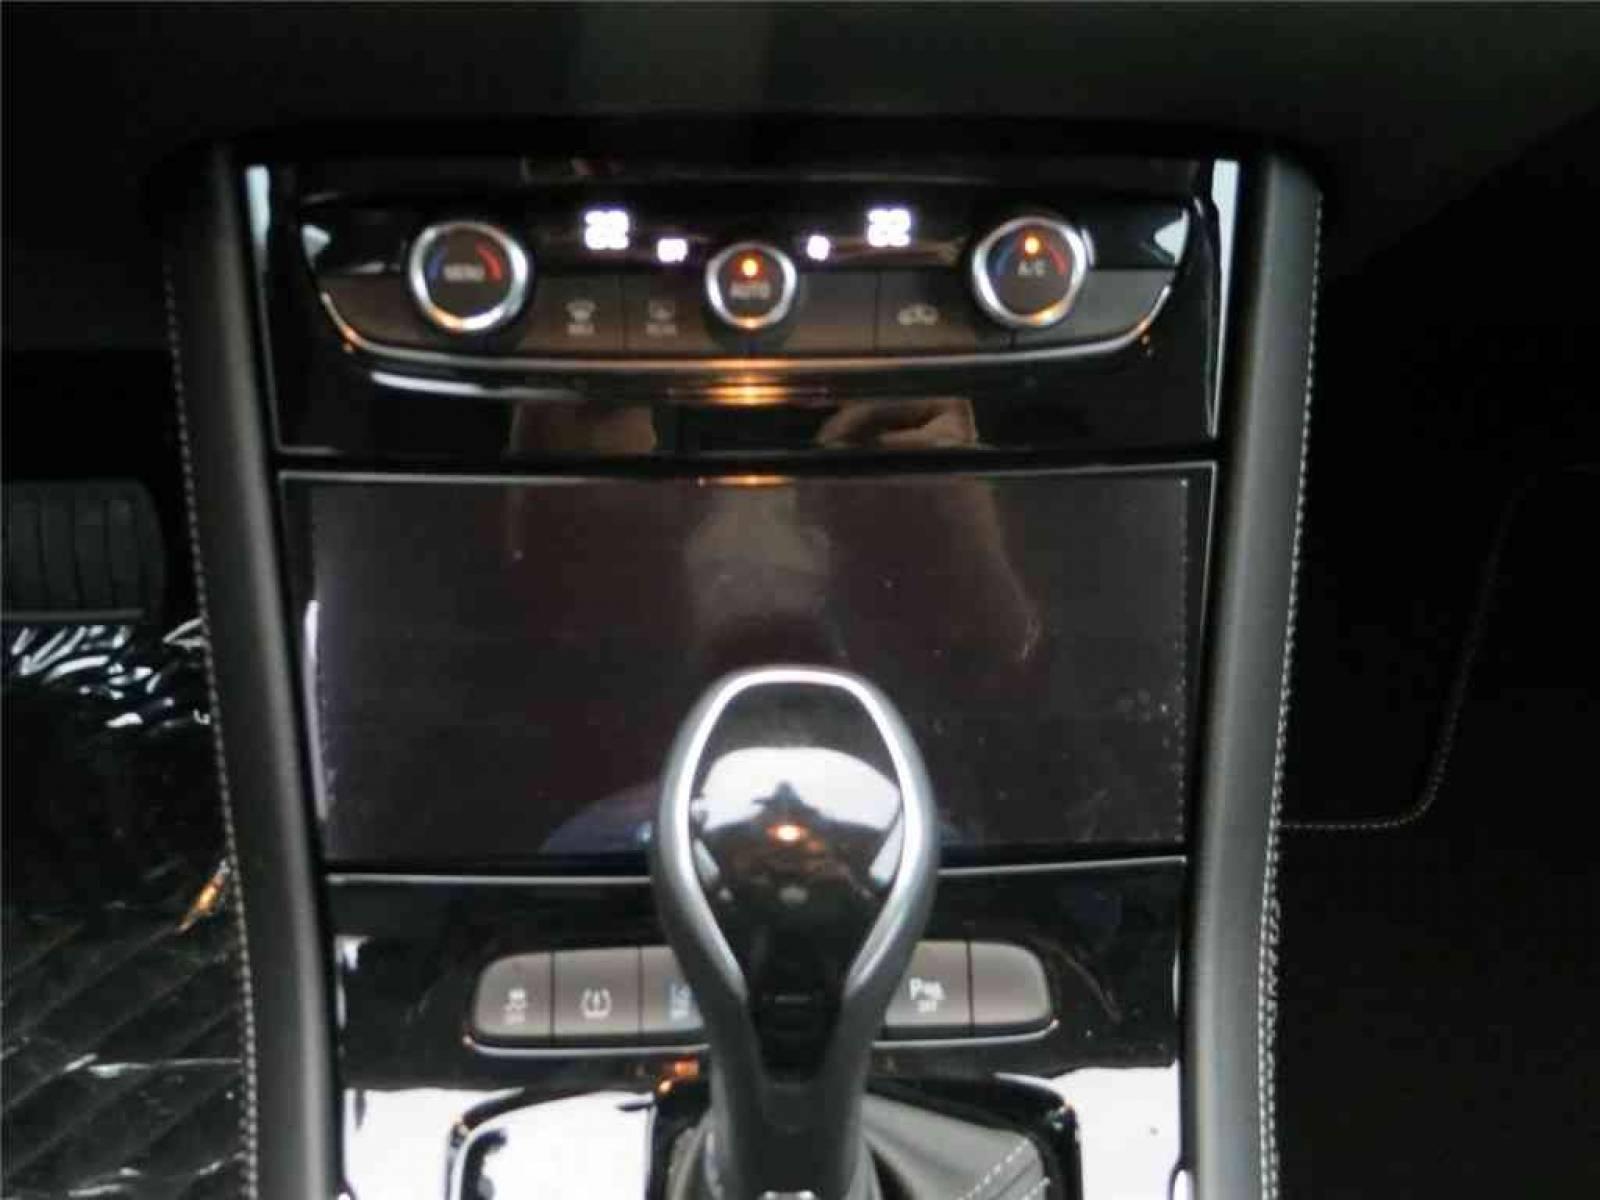 OPEL Grandland X 1.5 Diesel 130 ch BVA8 - véhicule d'occasion - Groupe Guillet - Opel Magicauto - Chalon-sur-Saône - 71380 - Saint-Marcel - 31